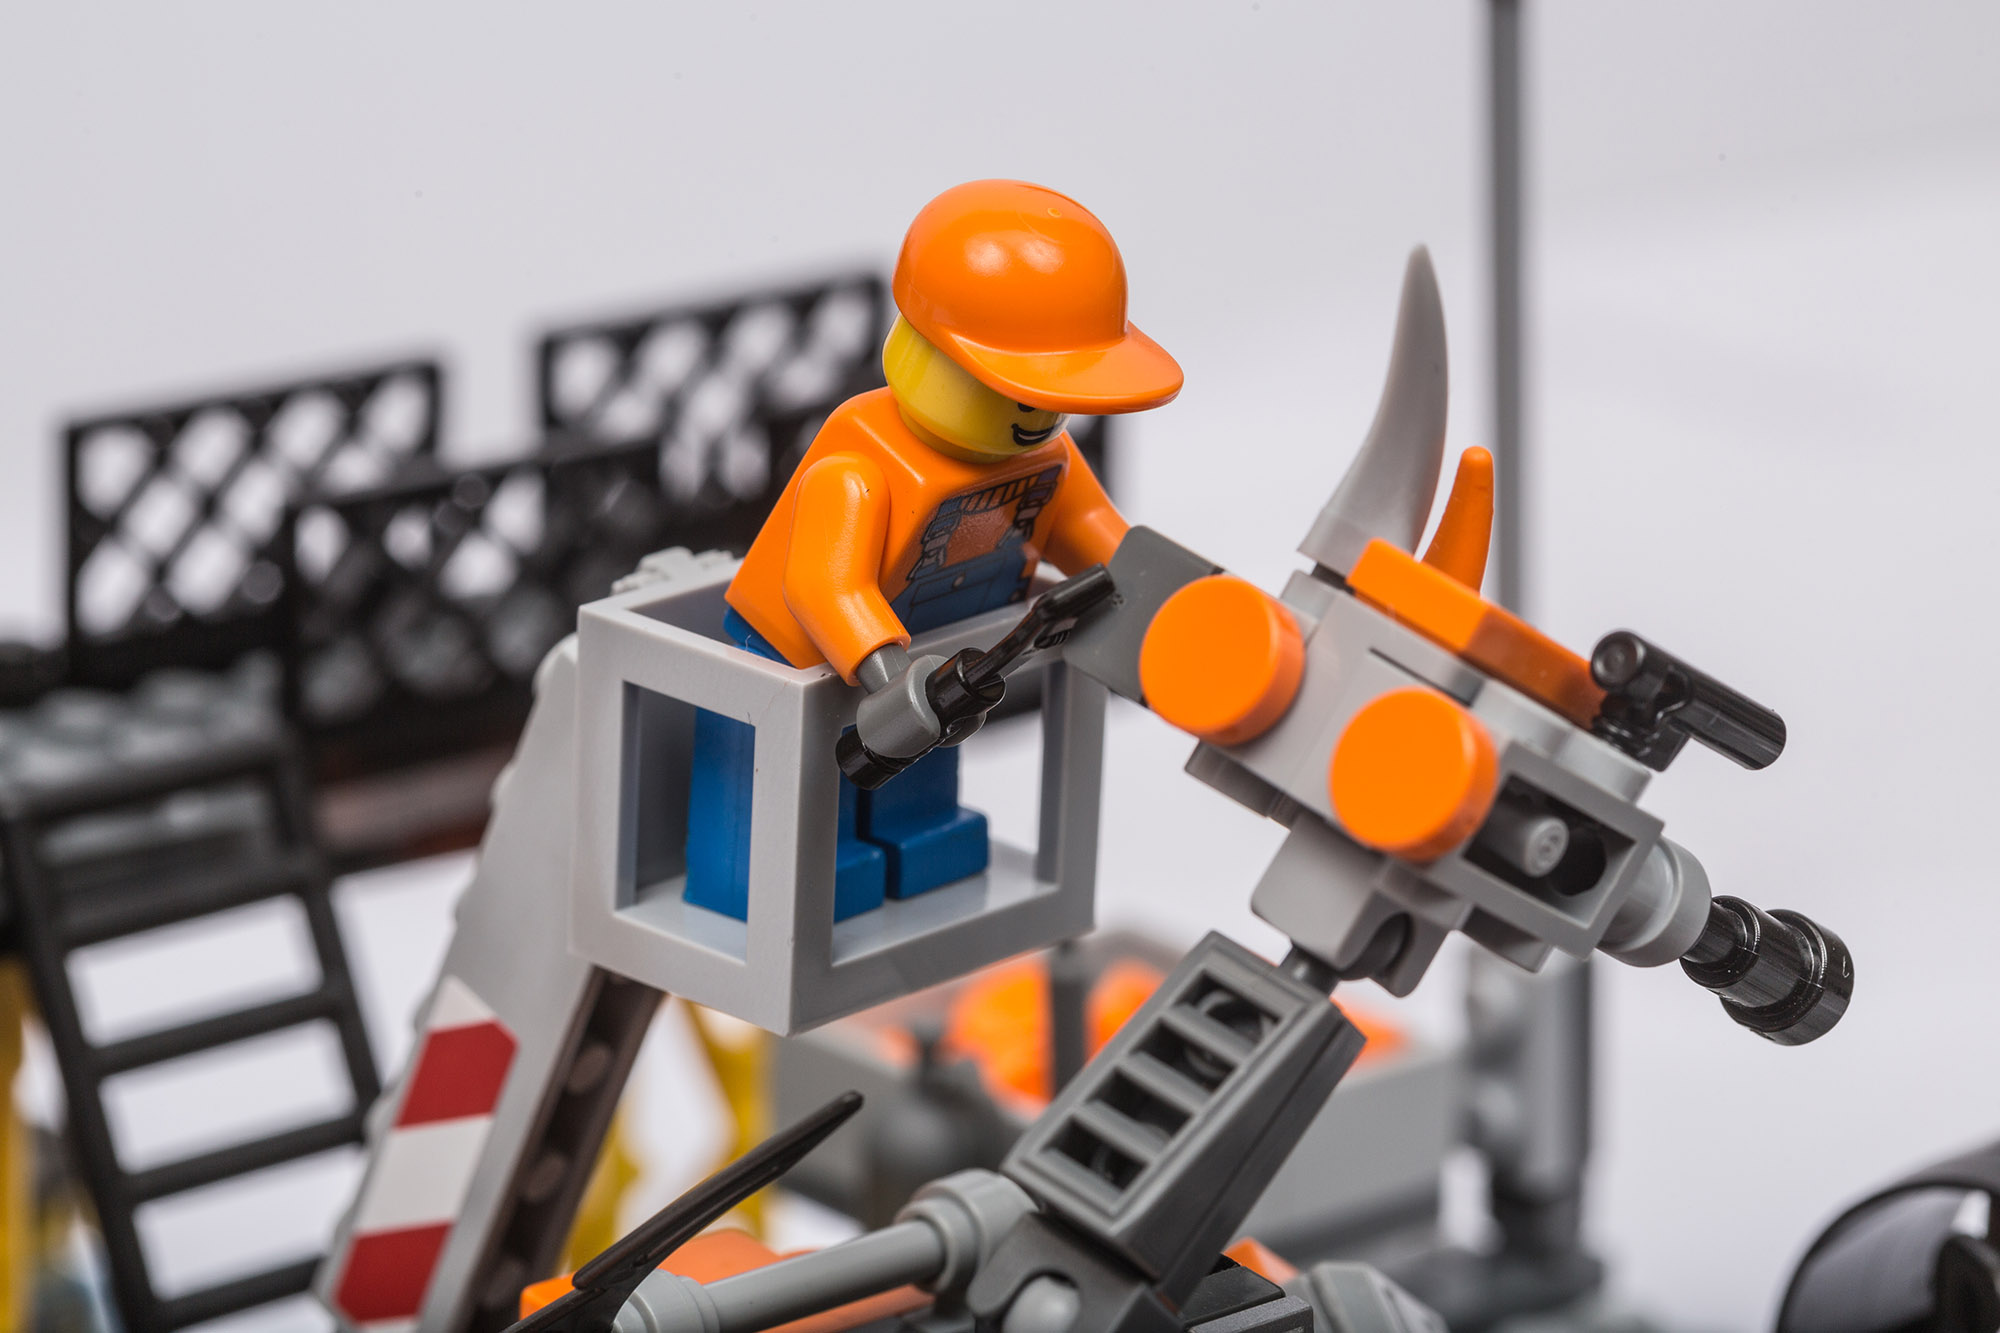 1018_LegoMOC_ThundersuitLaunchbay-7715.jpg